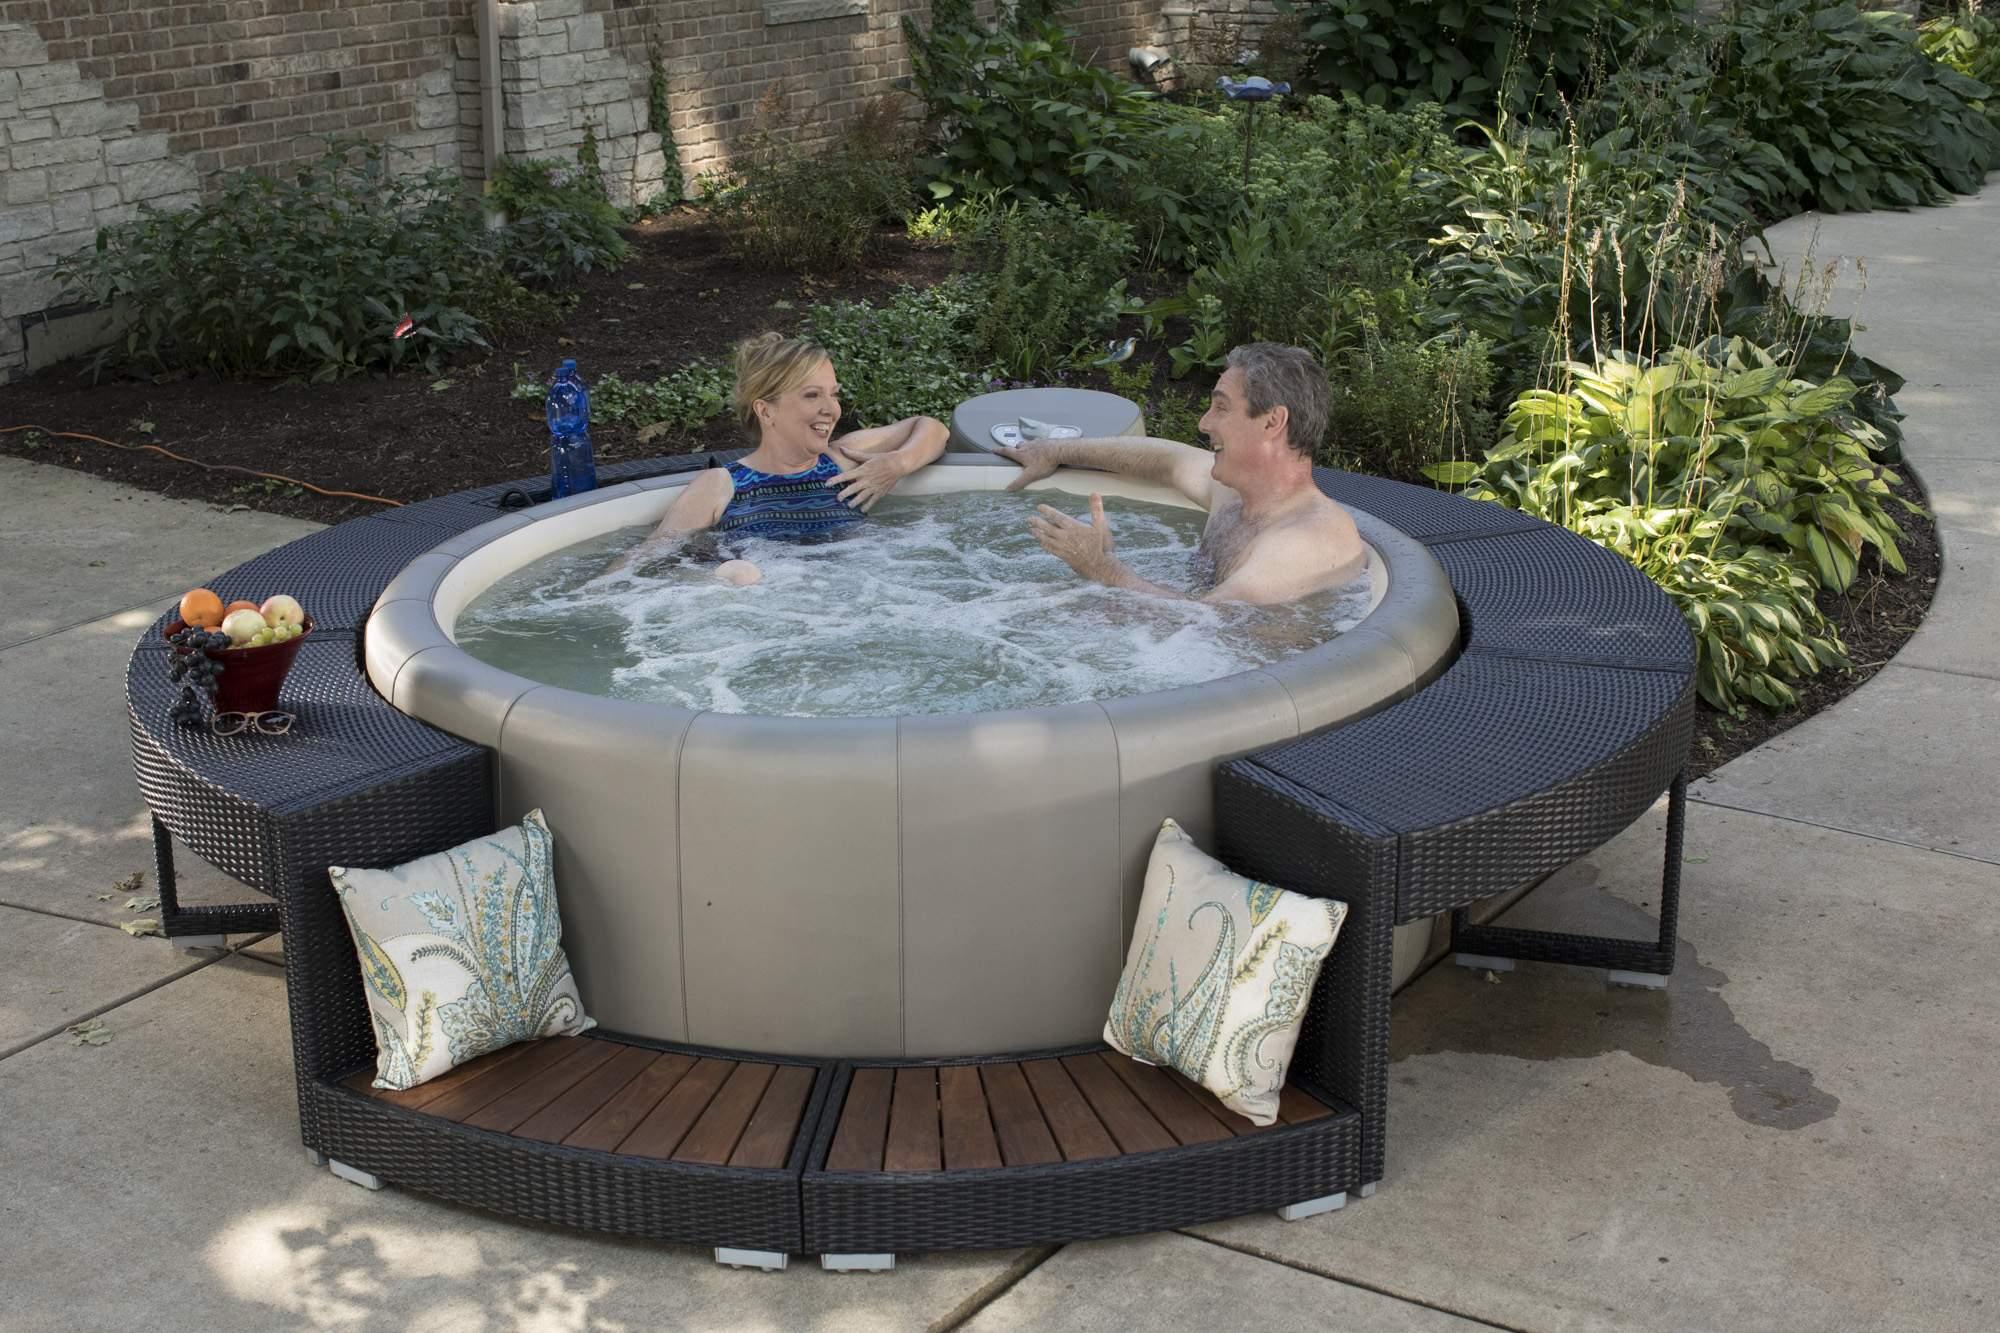 Whirlpool Garten Elegant softub Whirlpool Resort In Leathertex™ Oder Syntex™